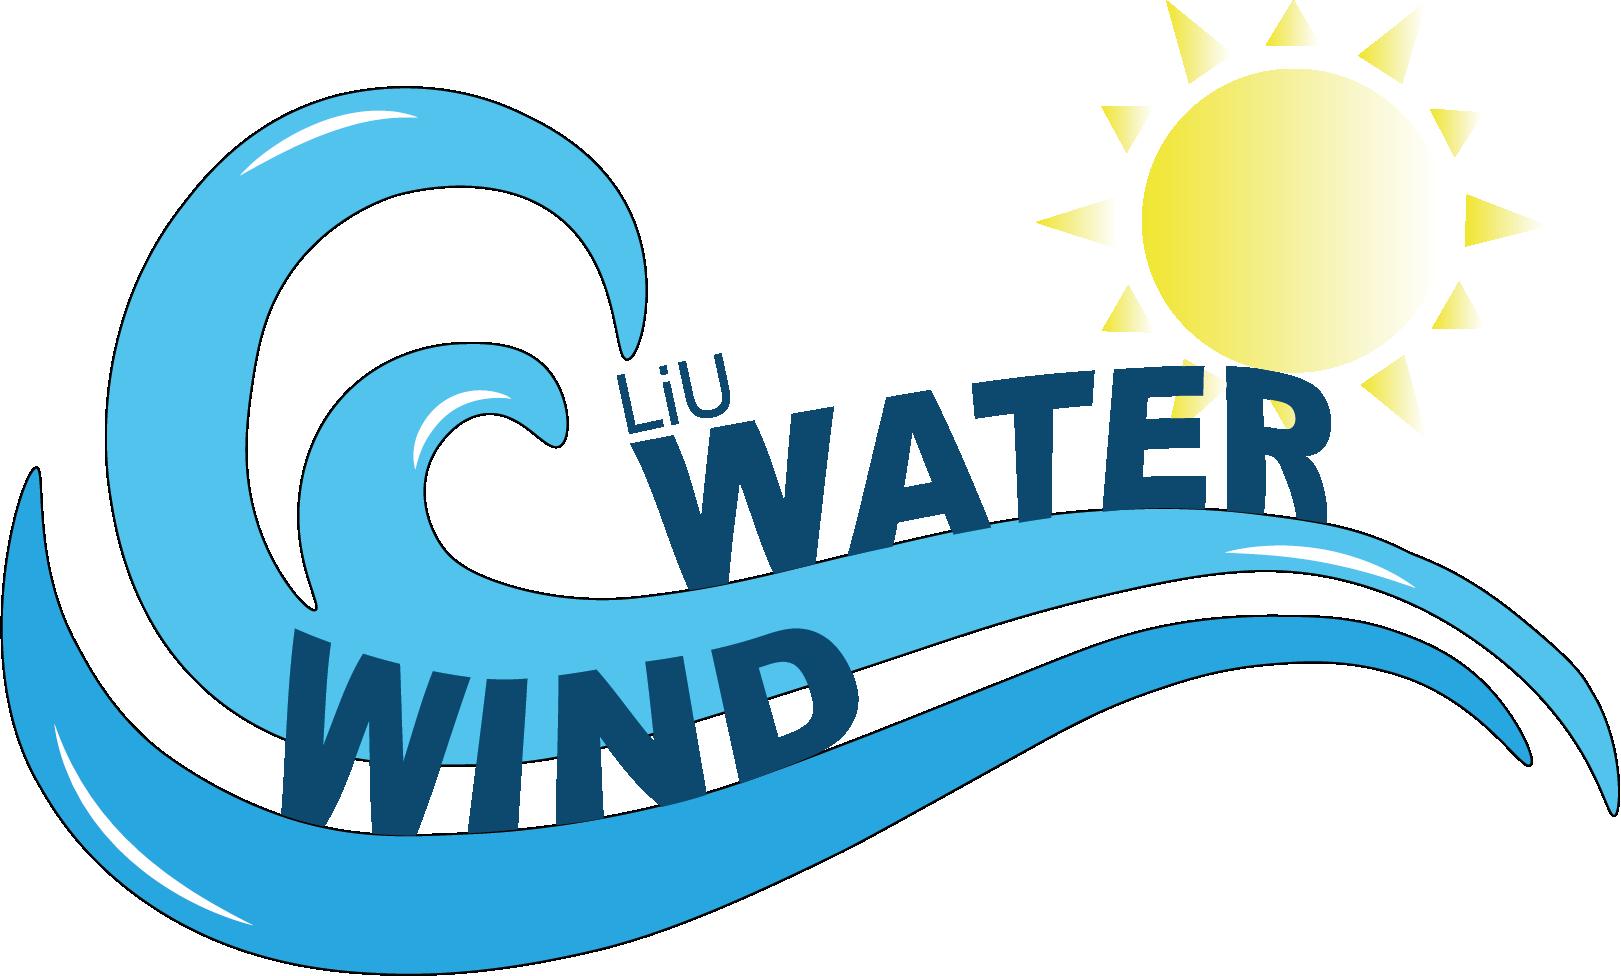 LiU Water & Wind